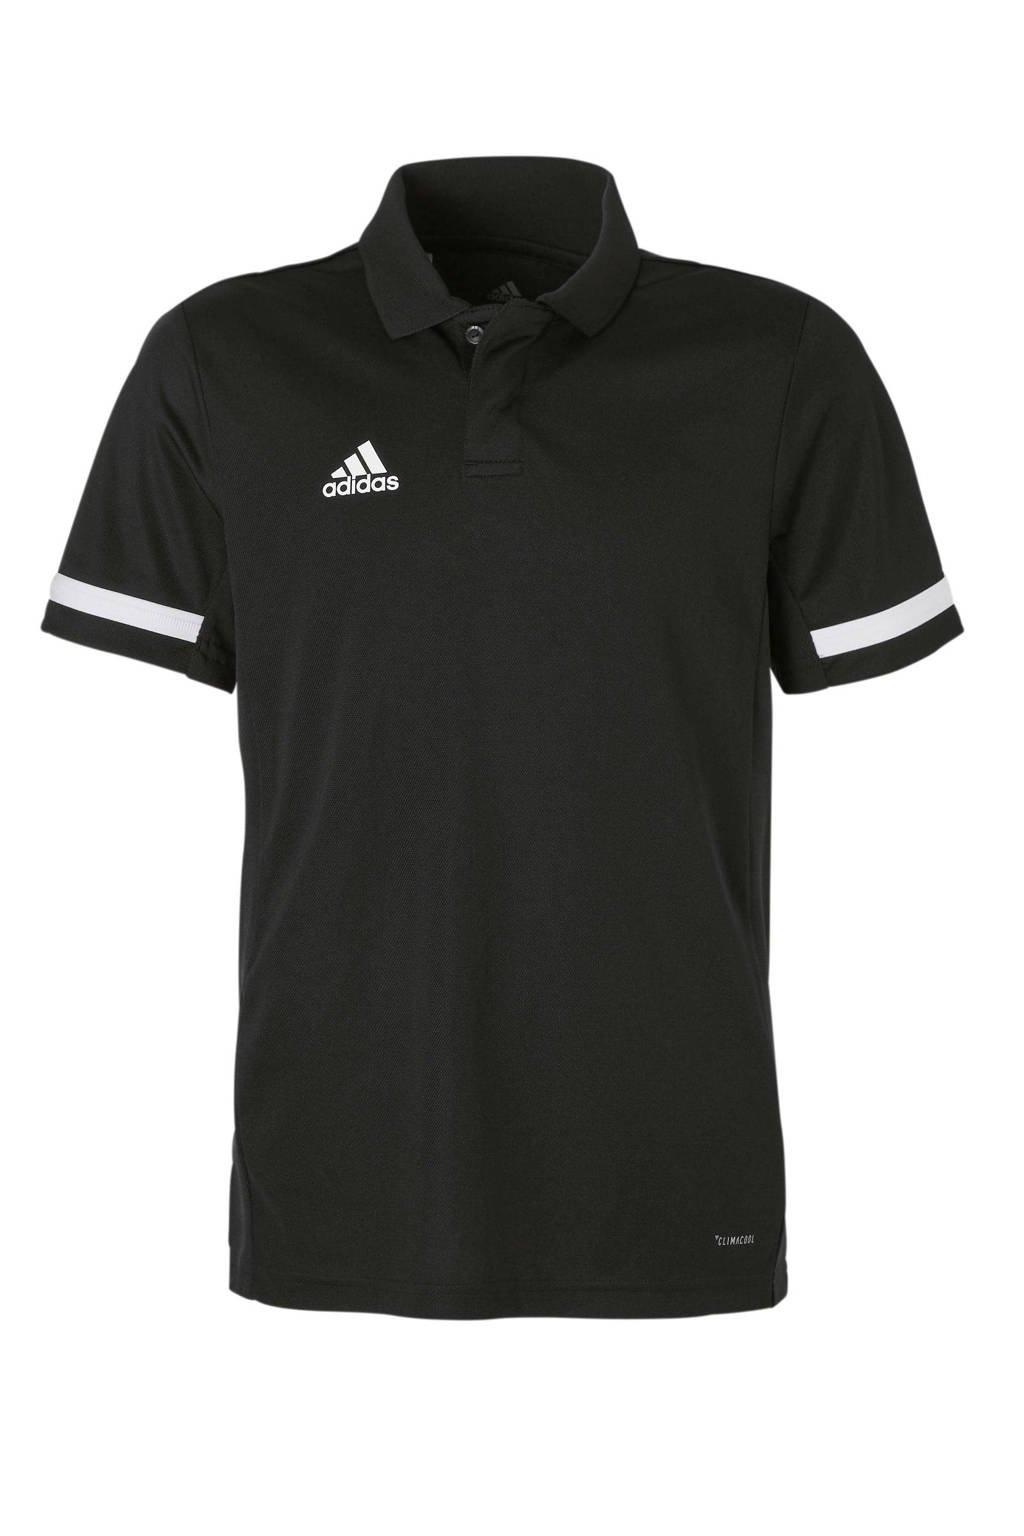 adidas performance   sportpolo T19 zwart, Zwart